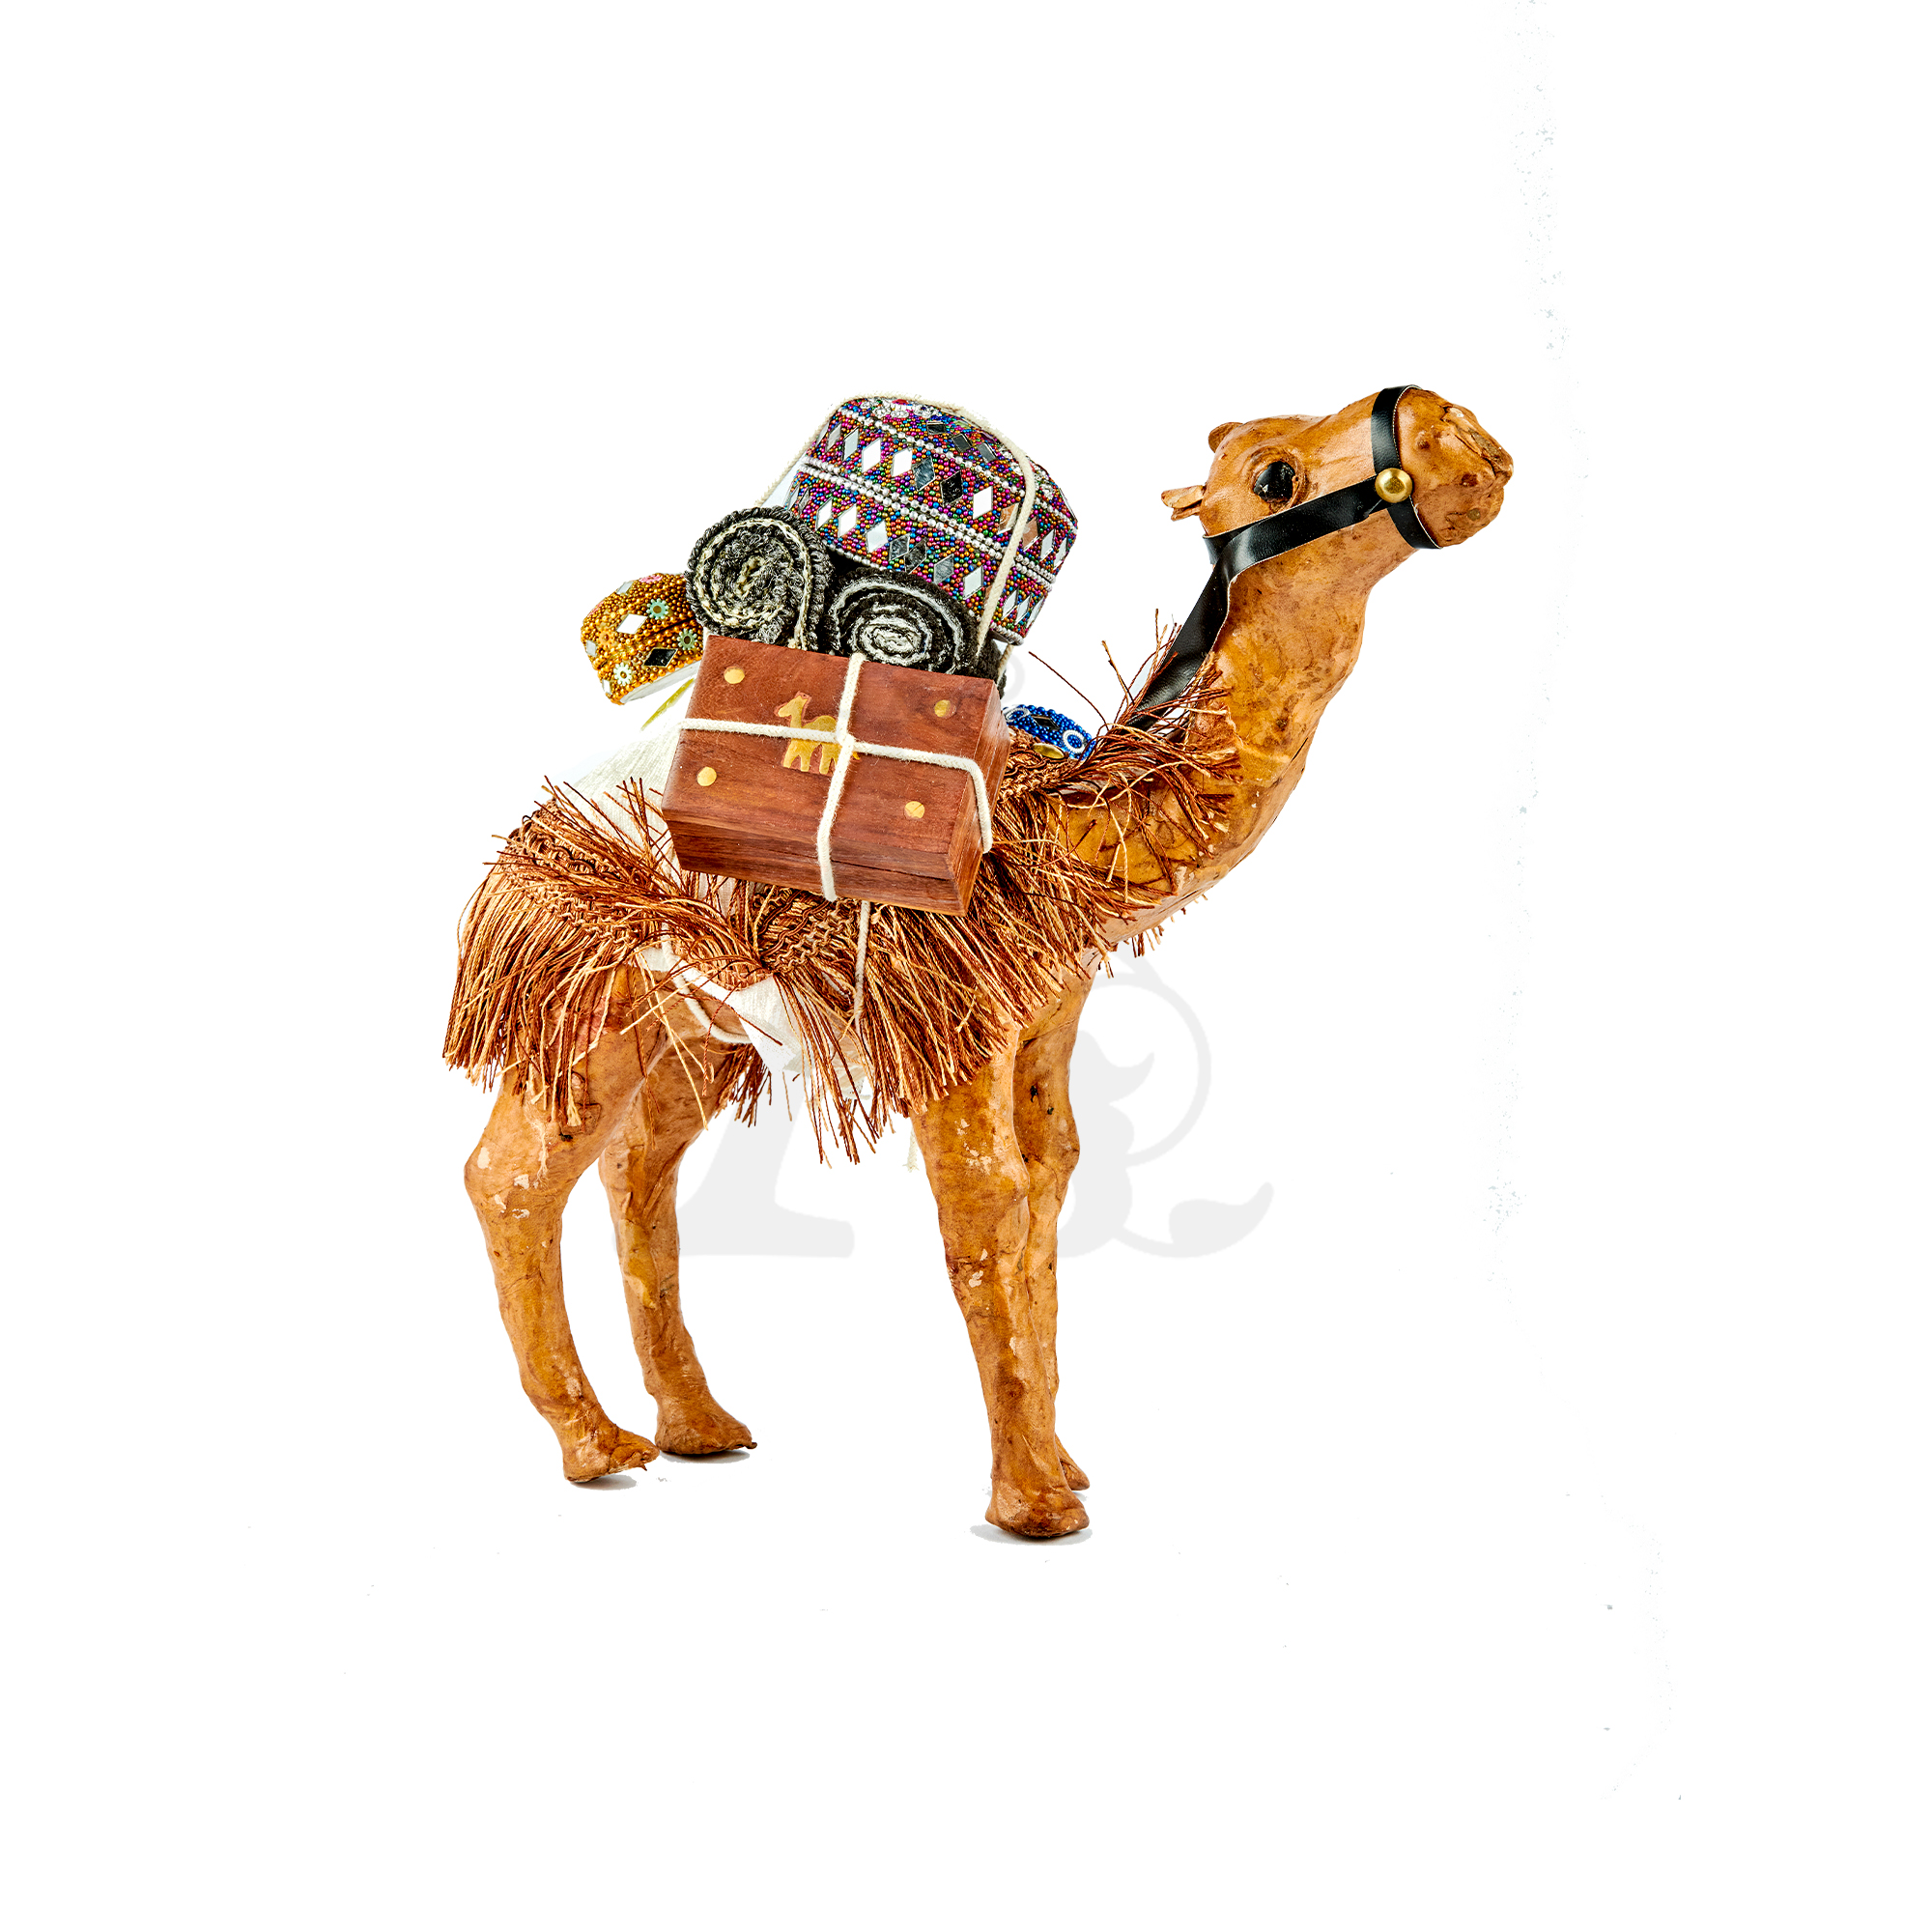 Buy Camel with Supplies - Medium